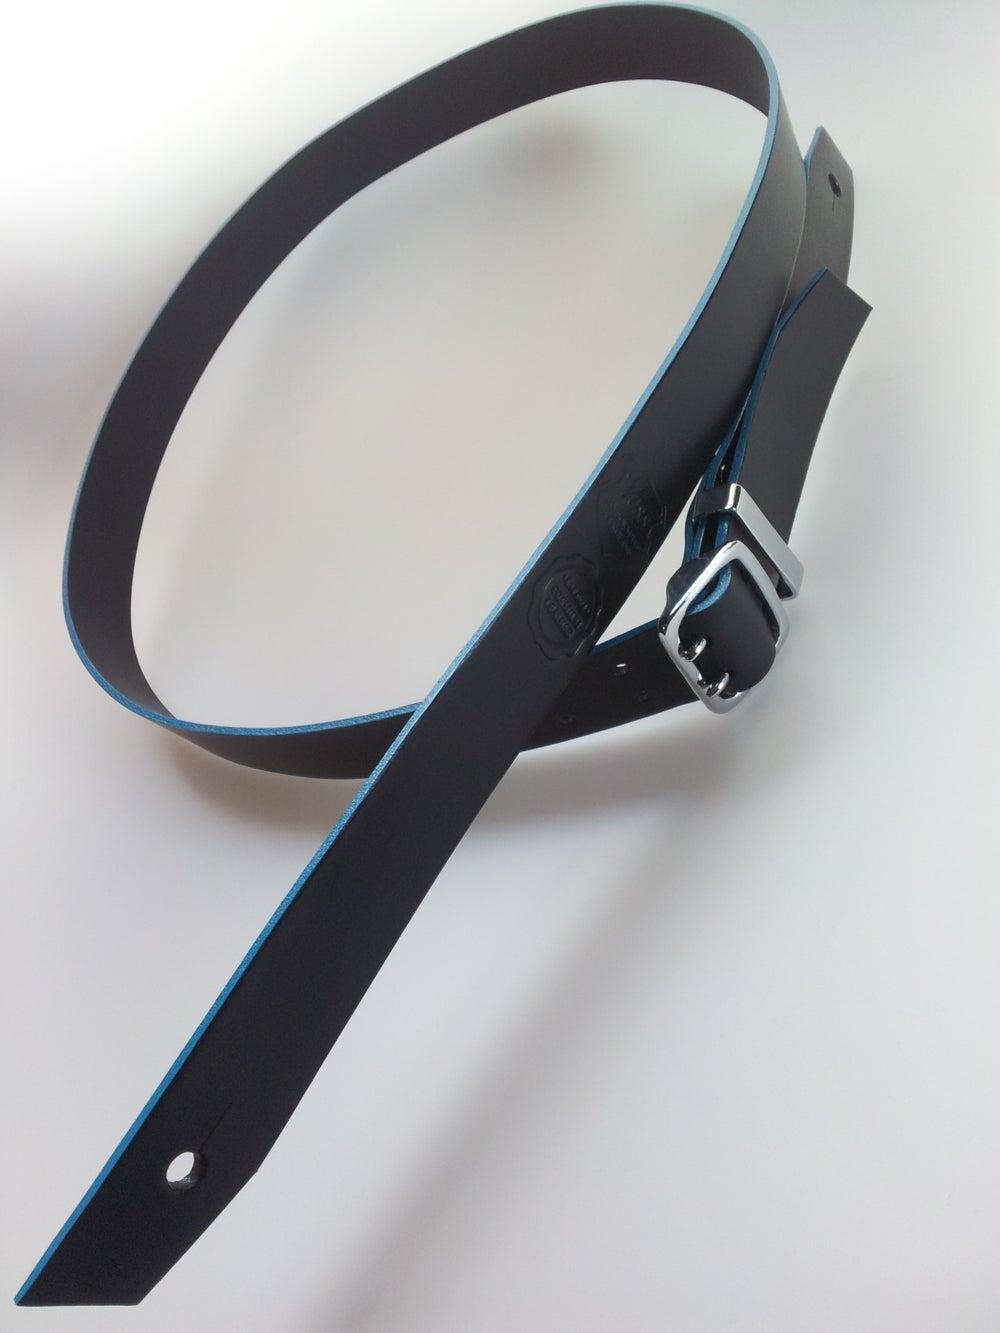 Image of Count Loop Chrome / Guitar Strap + Aqua Edge / Colour Options